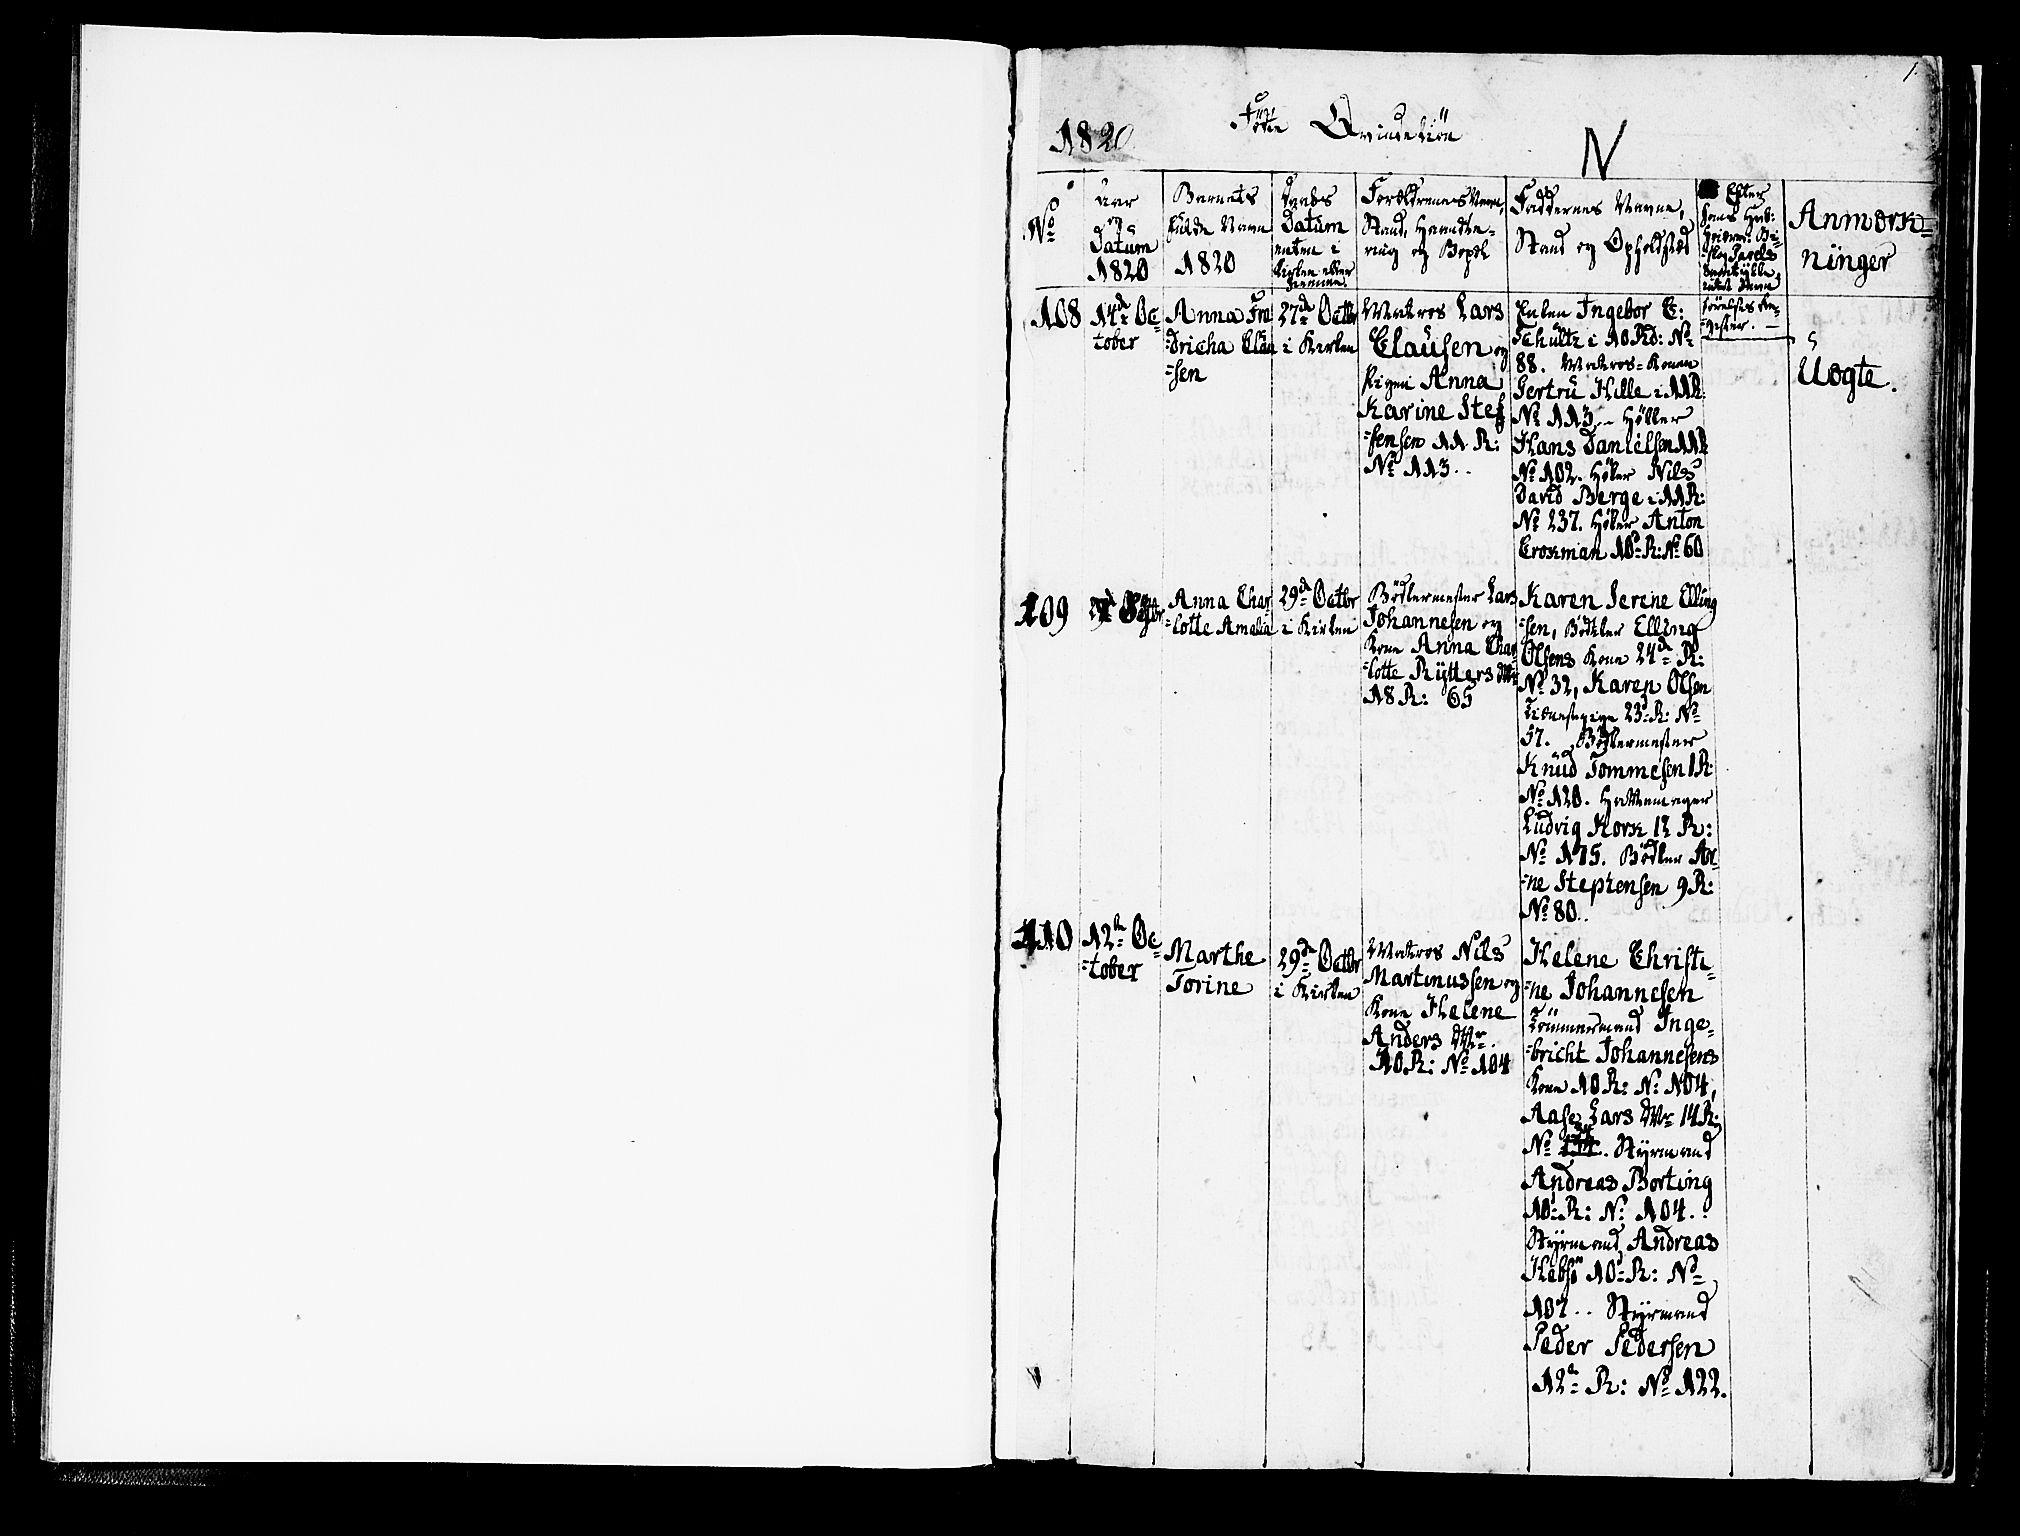 SAB, Domkirken Sokneprestembete, H/Haa/L0011: Ministerialbok nr. A 11, 1820-1821, s. 1